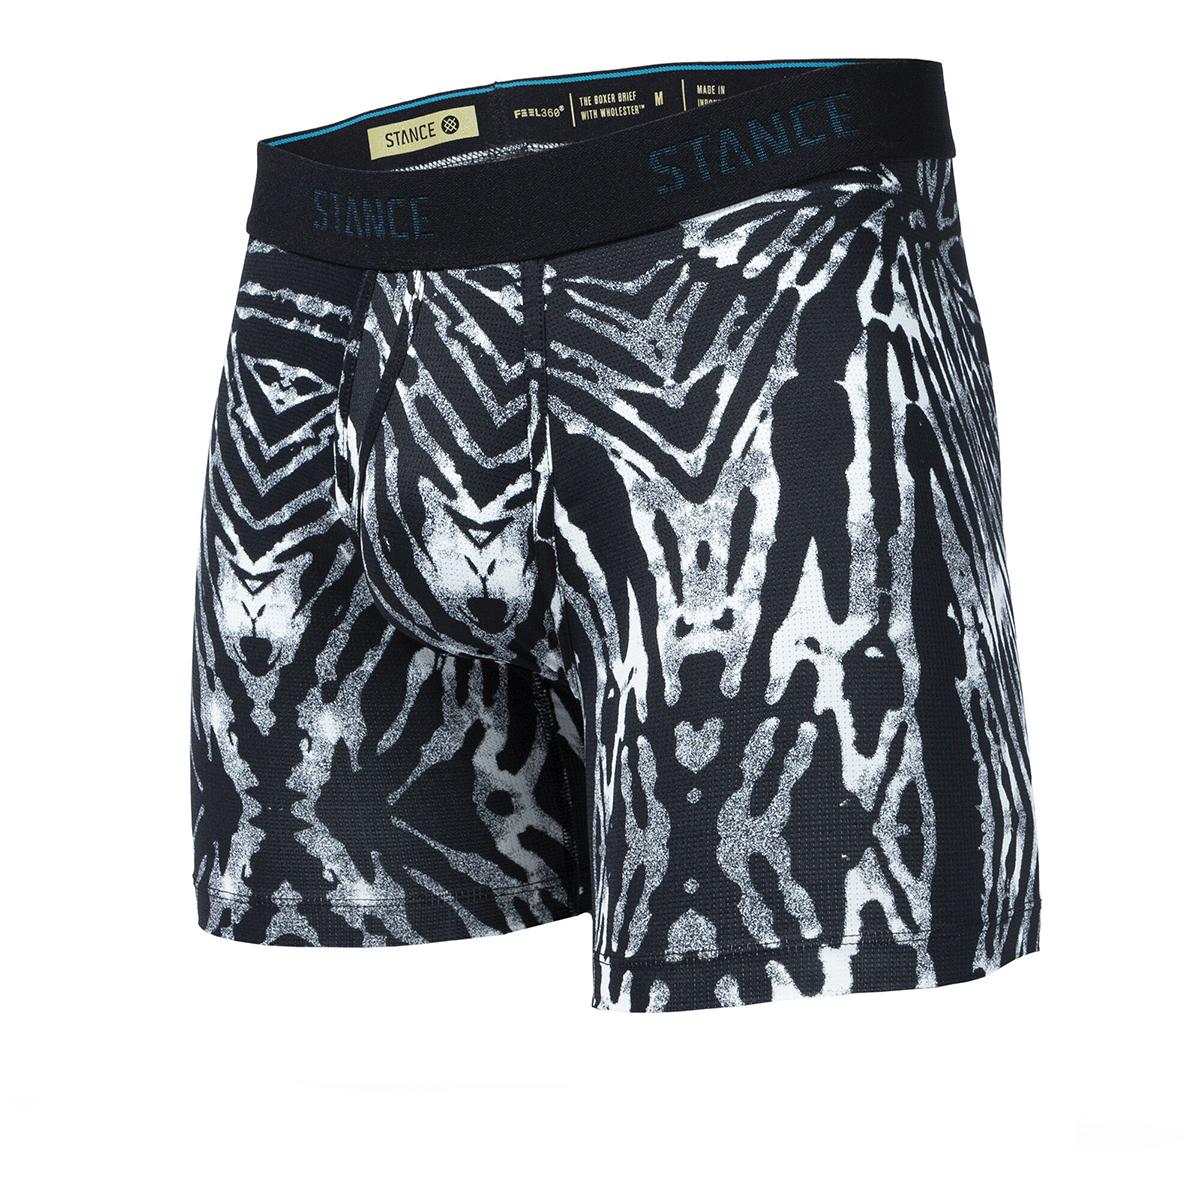 Men's Stance Helquist Boxer Brief Wholester - Color: Black/Grey - Size: S, Black/Grey, large, image 1